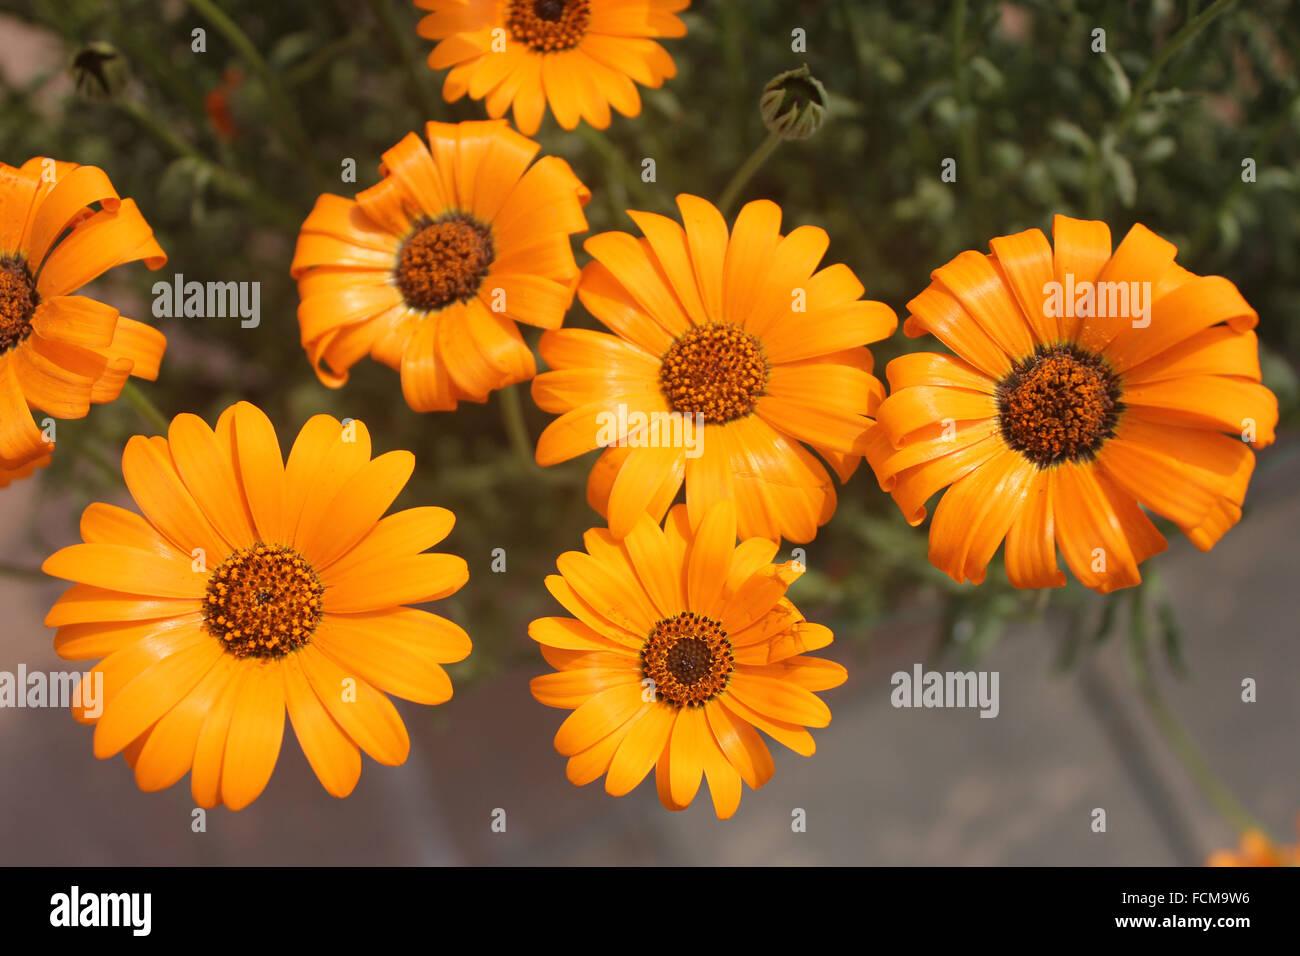 Daisy Flower - Types of Daisies | TheFlowerExpert